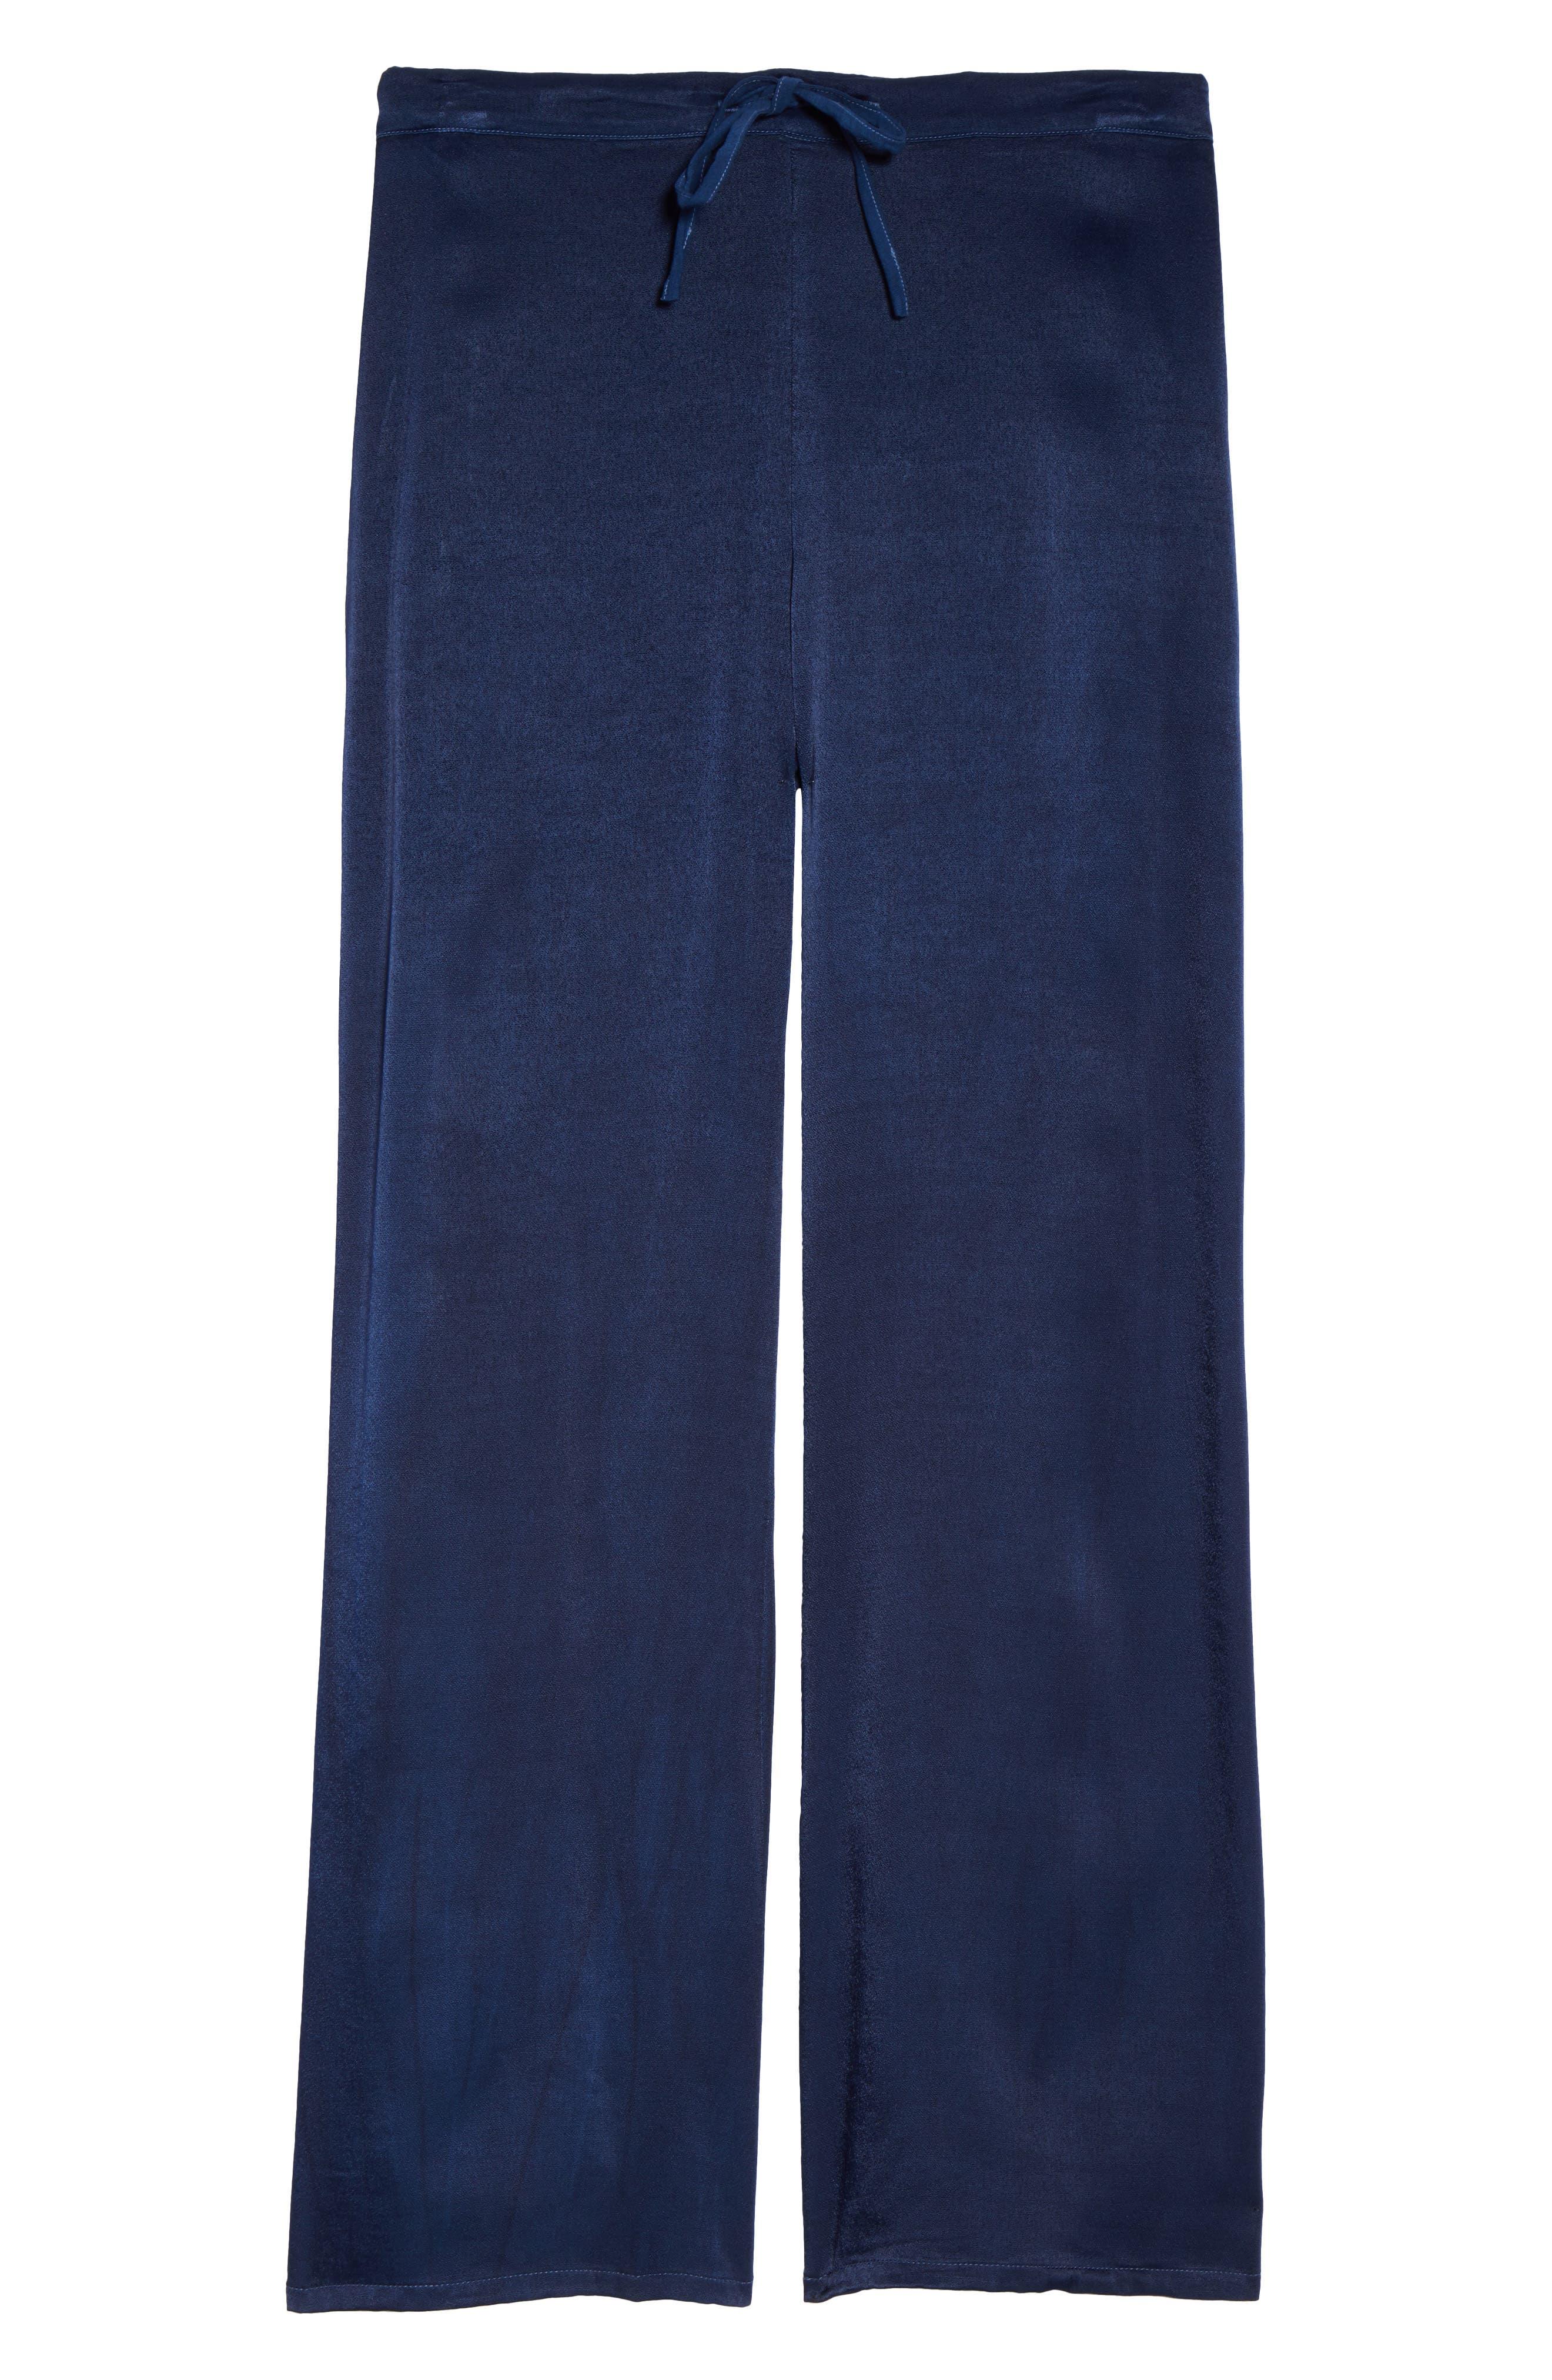 Vela Pajama Pants,                             Alternate thumbnail 11, color,